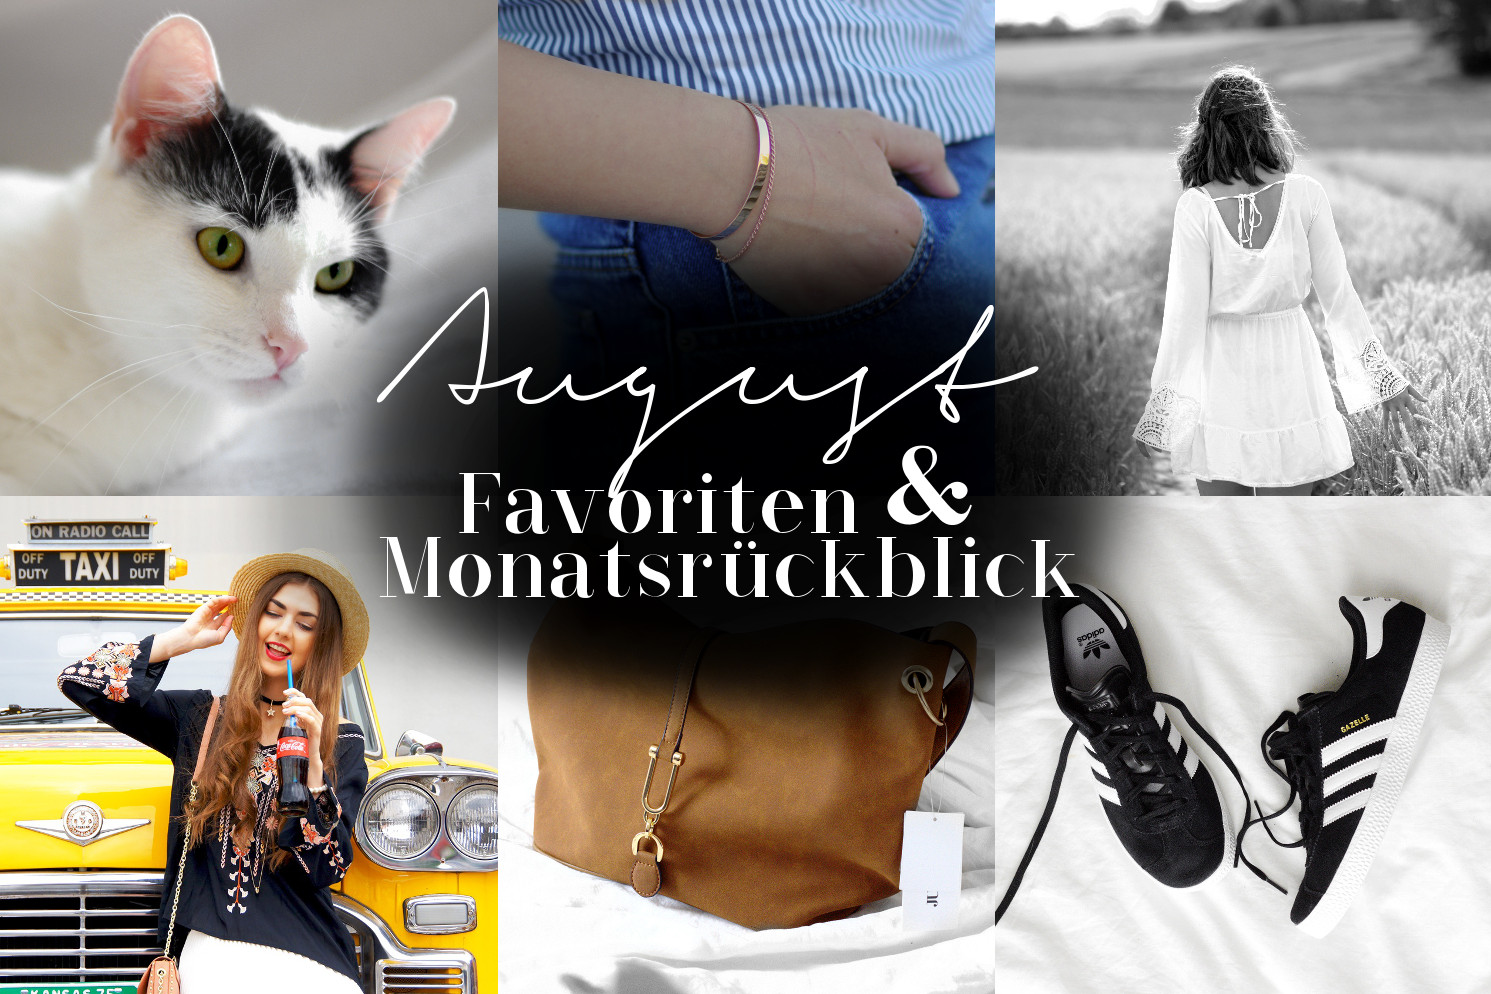 August Favoriten & Monatsrückblick